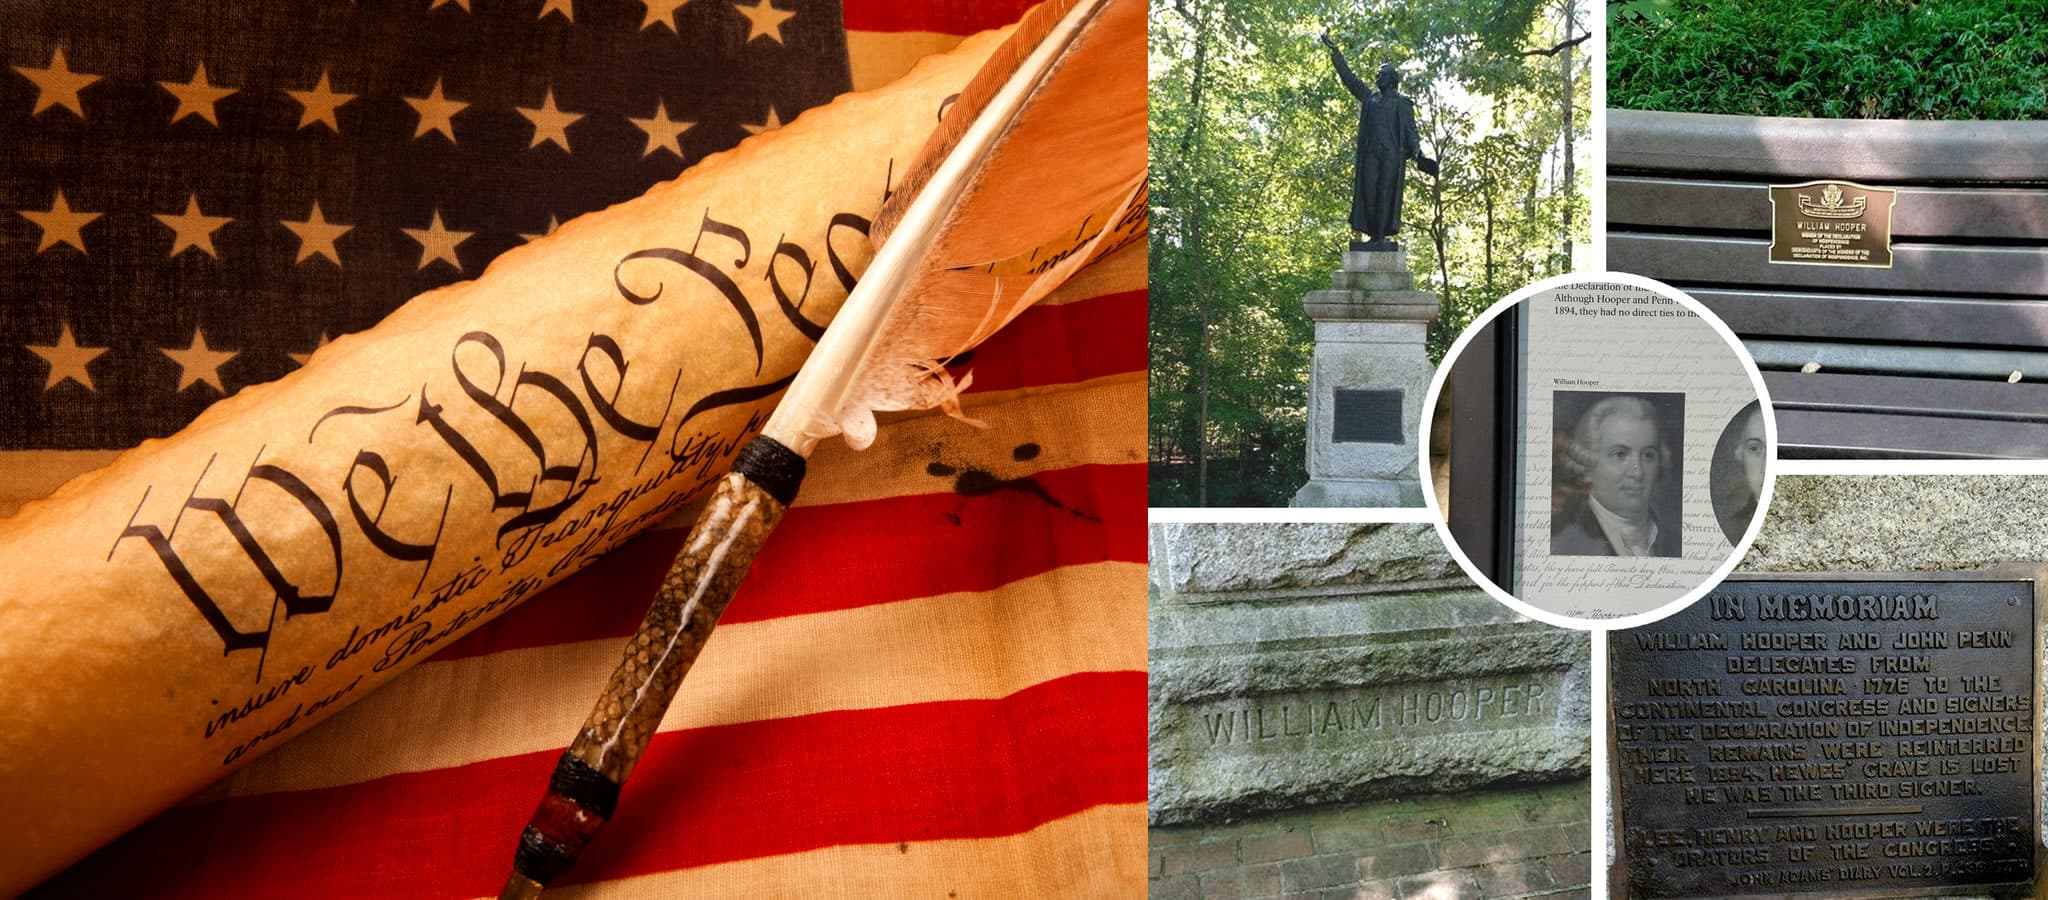 john-hooper-william-hooper-greensboro-nc-signer-of-the-declaration-of-independence-usa